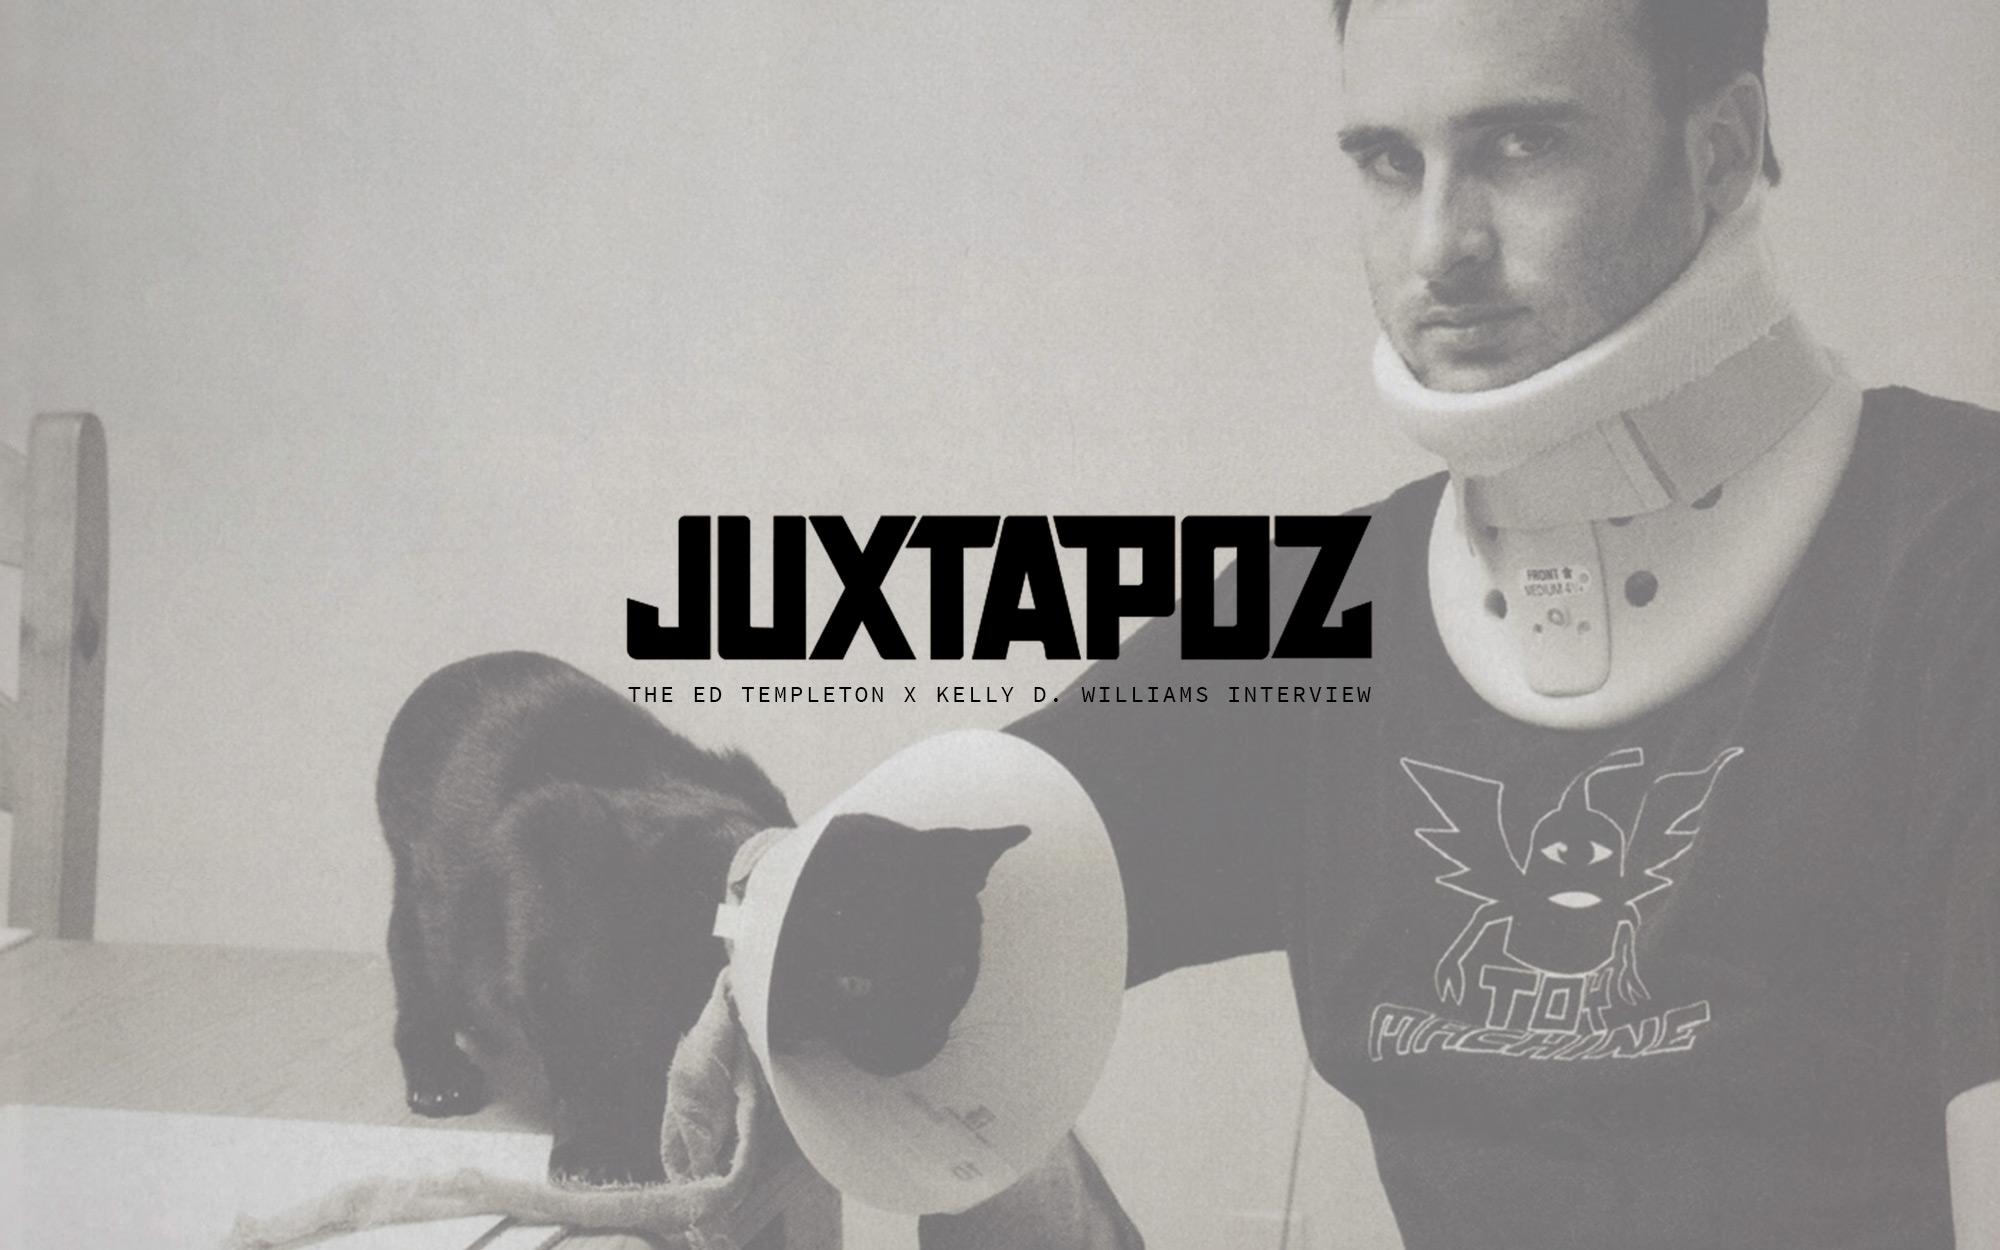 juxtapoz-ed-templeton-interview